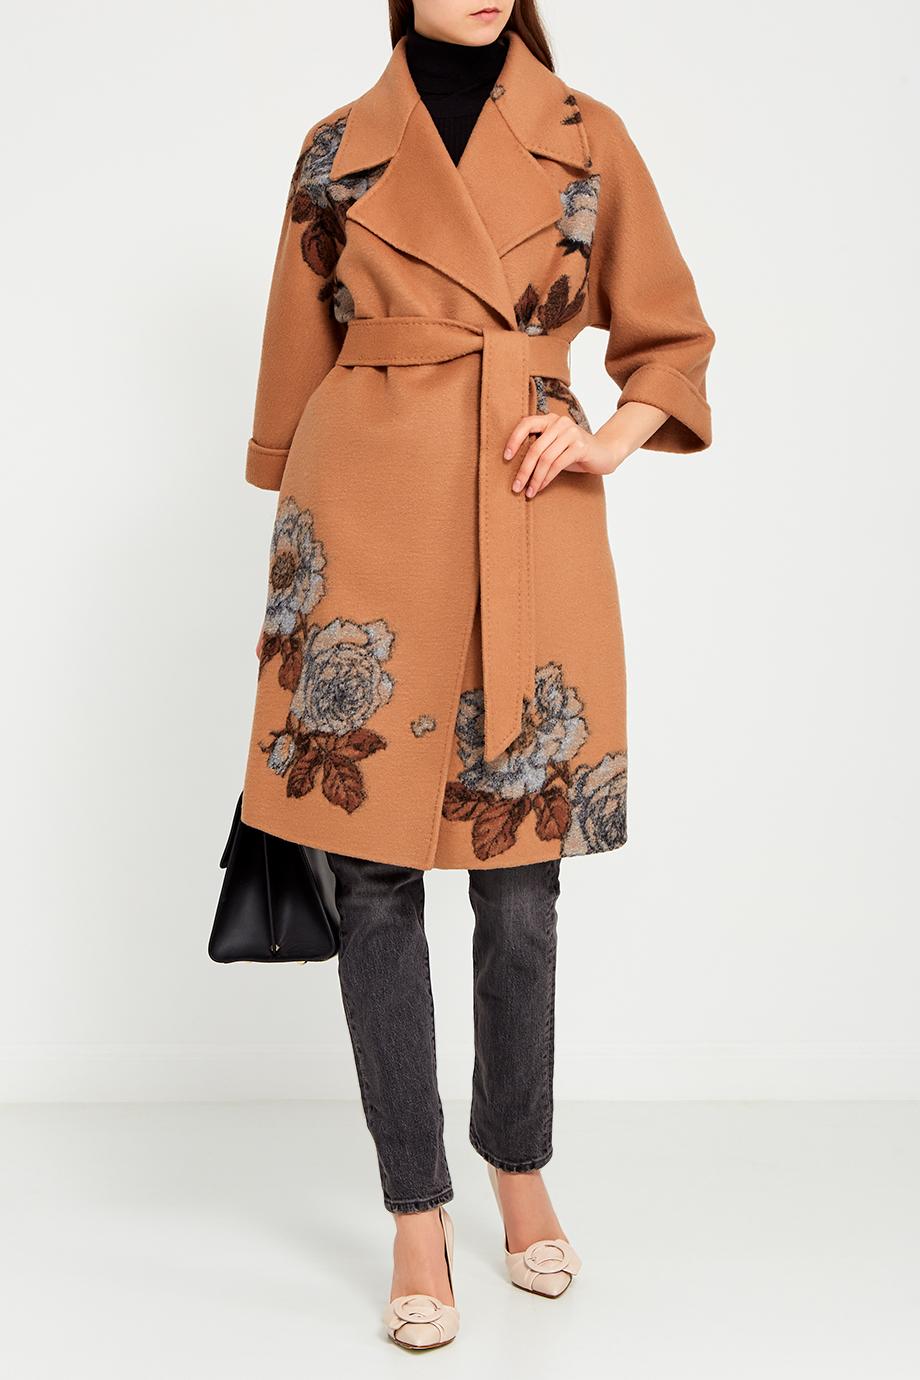 Пальто MILAMARSEL Пальто с вышивкой